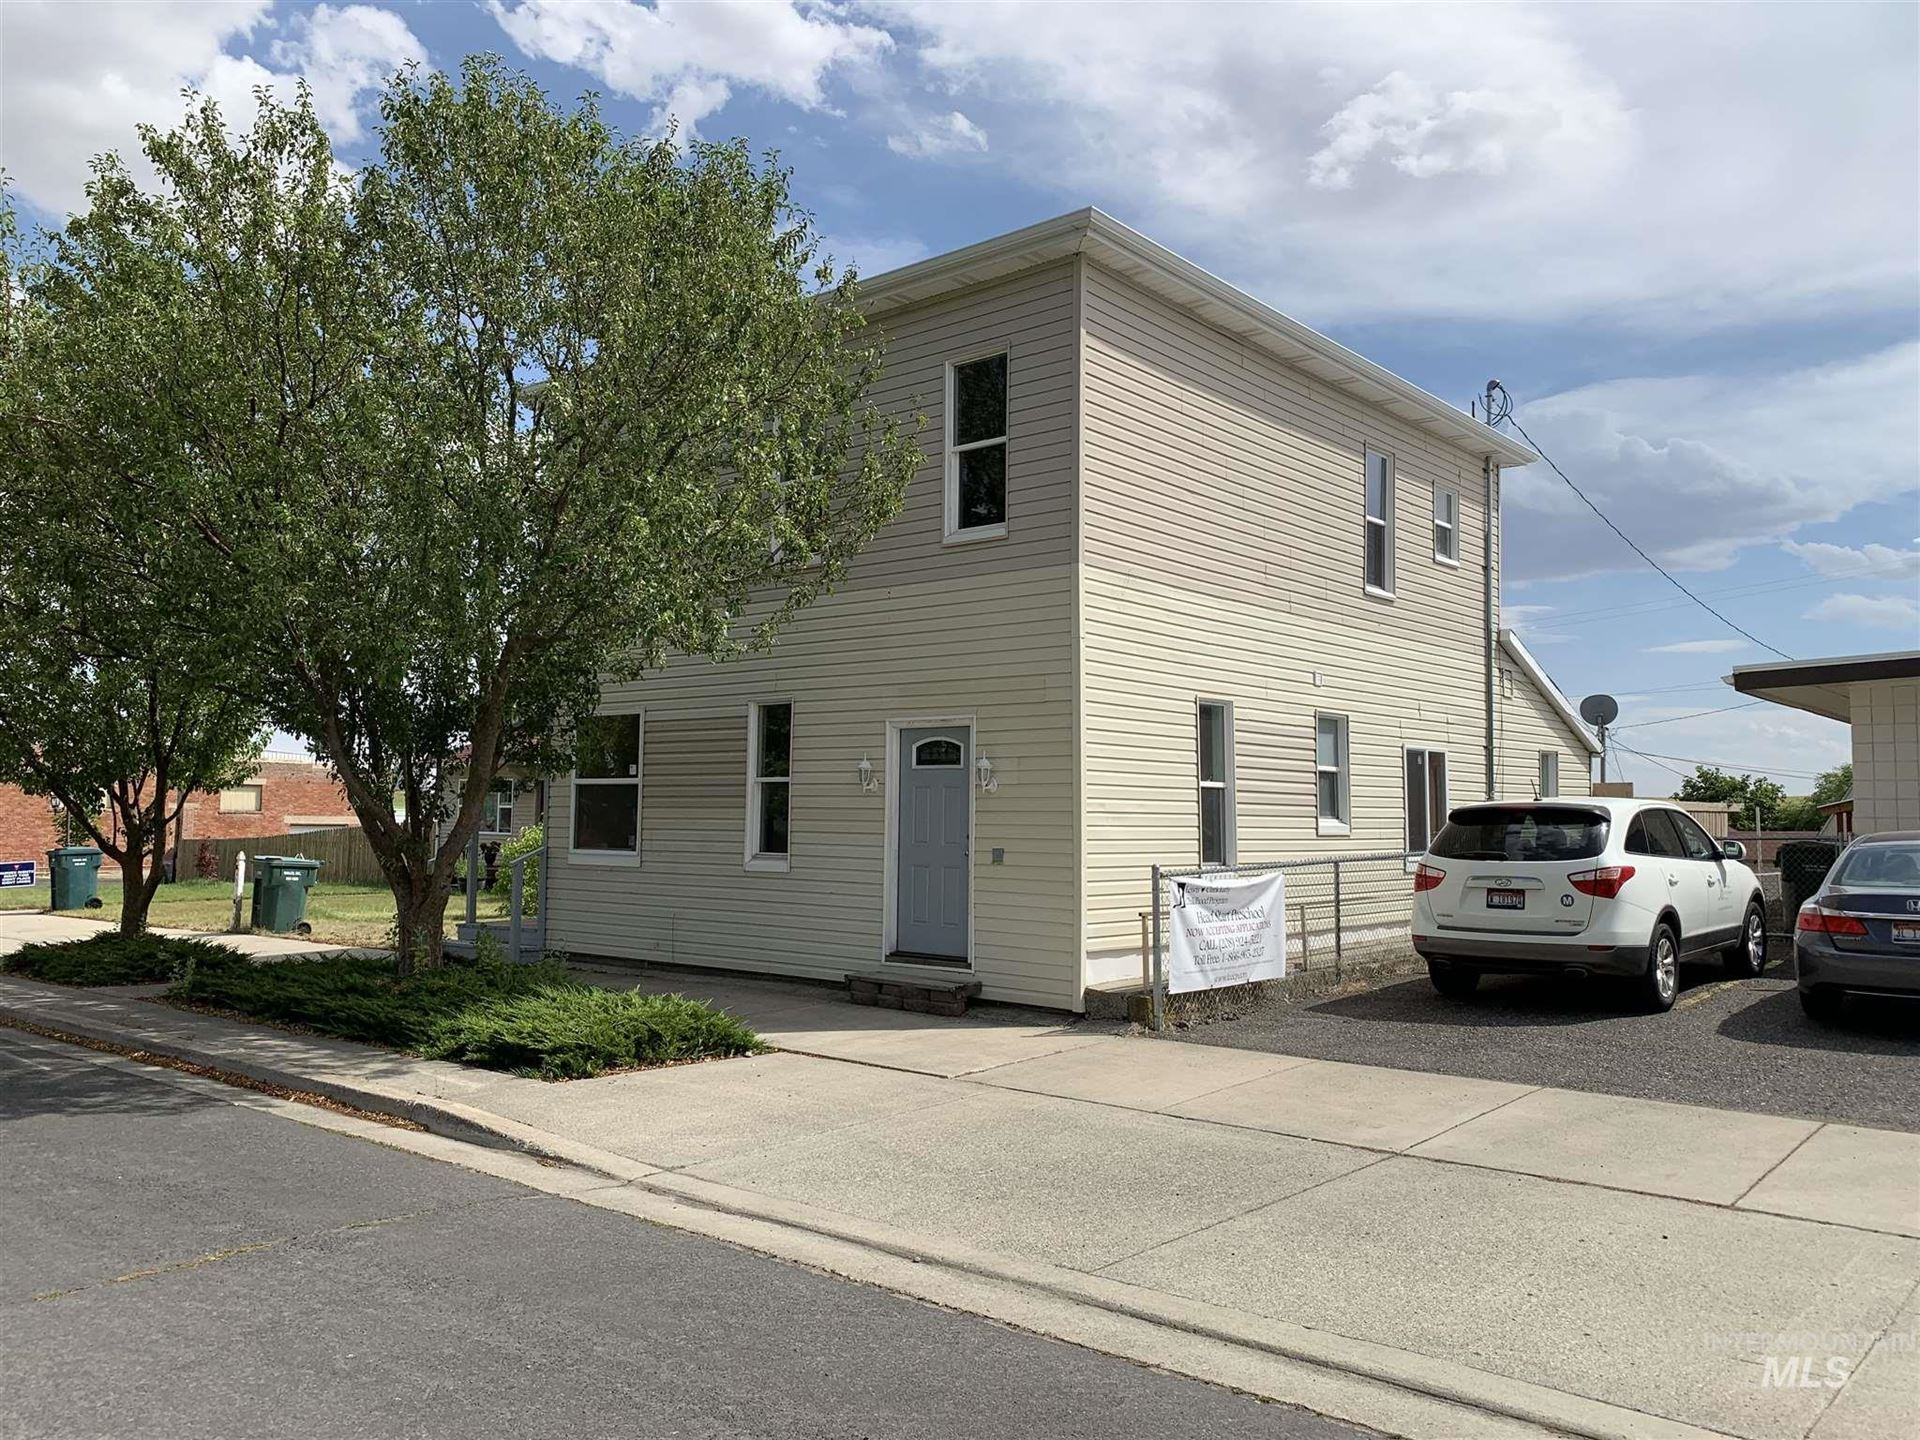 Photo of 207 W Main, Craigmont, ID 83523 (MLS # 98778628)